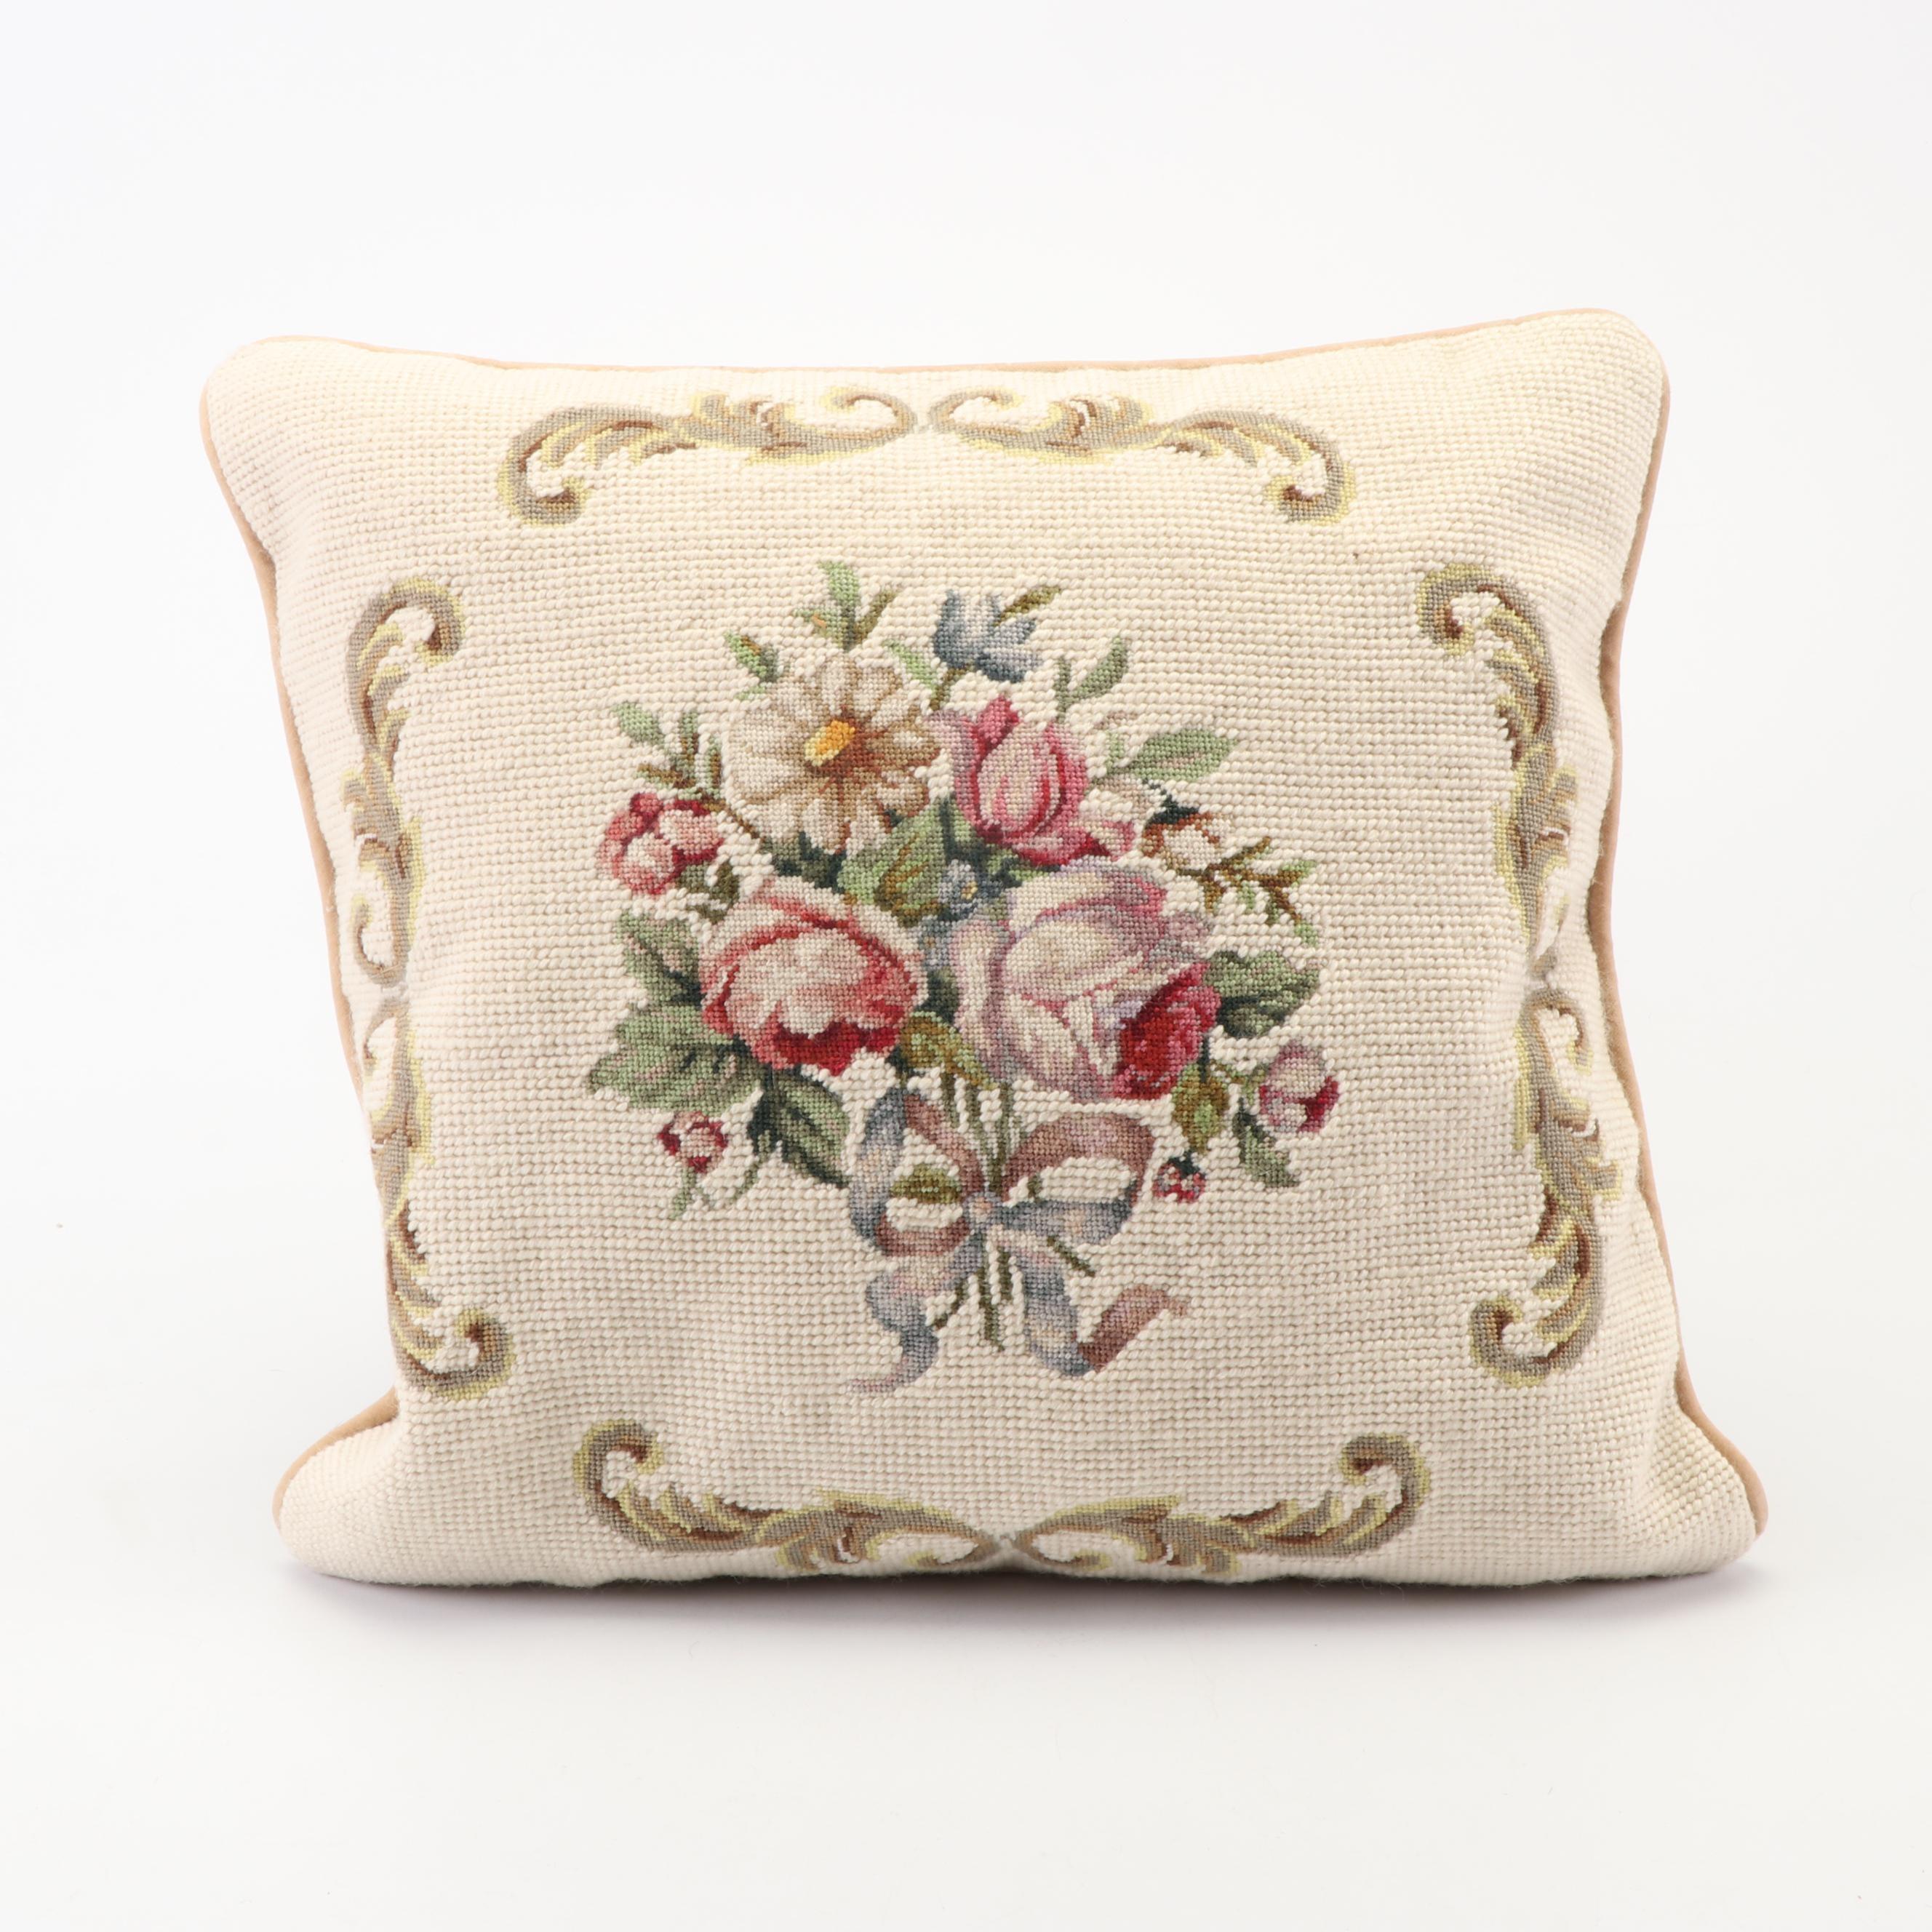 Steinwinder Enterprises Needlepoint Floral Bouquet Accent Pillow